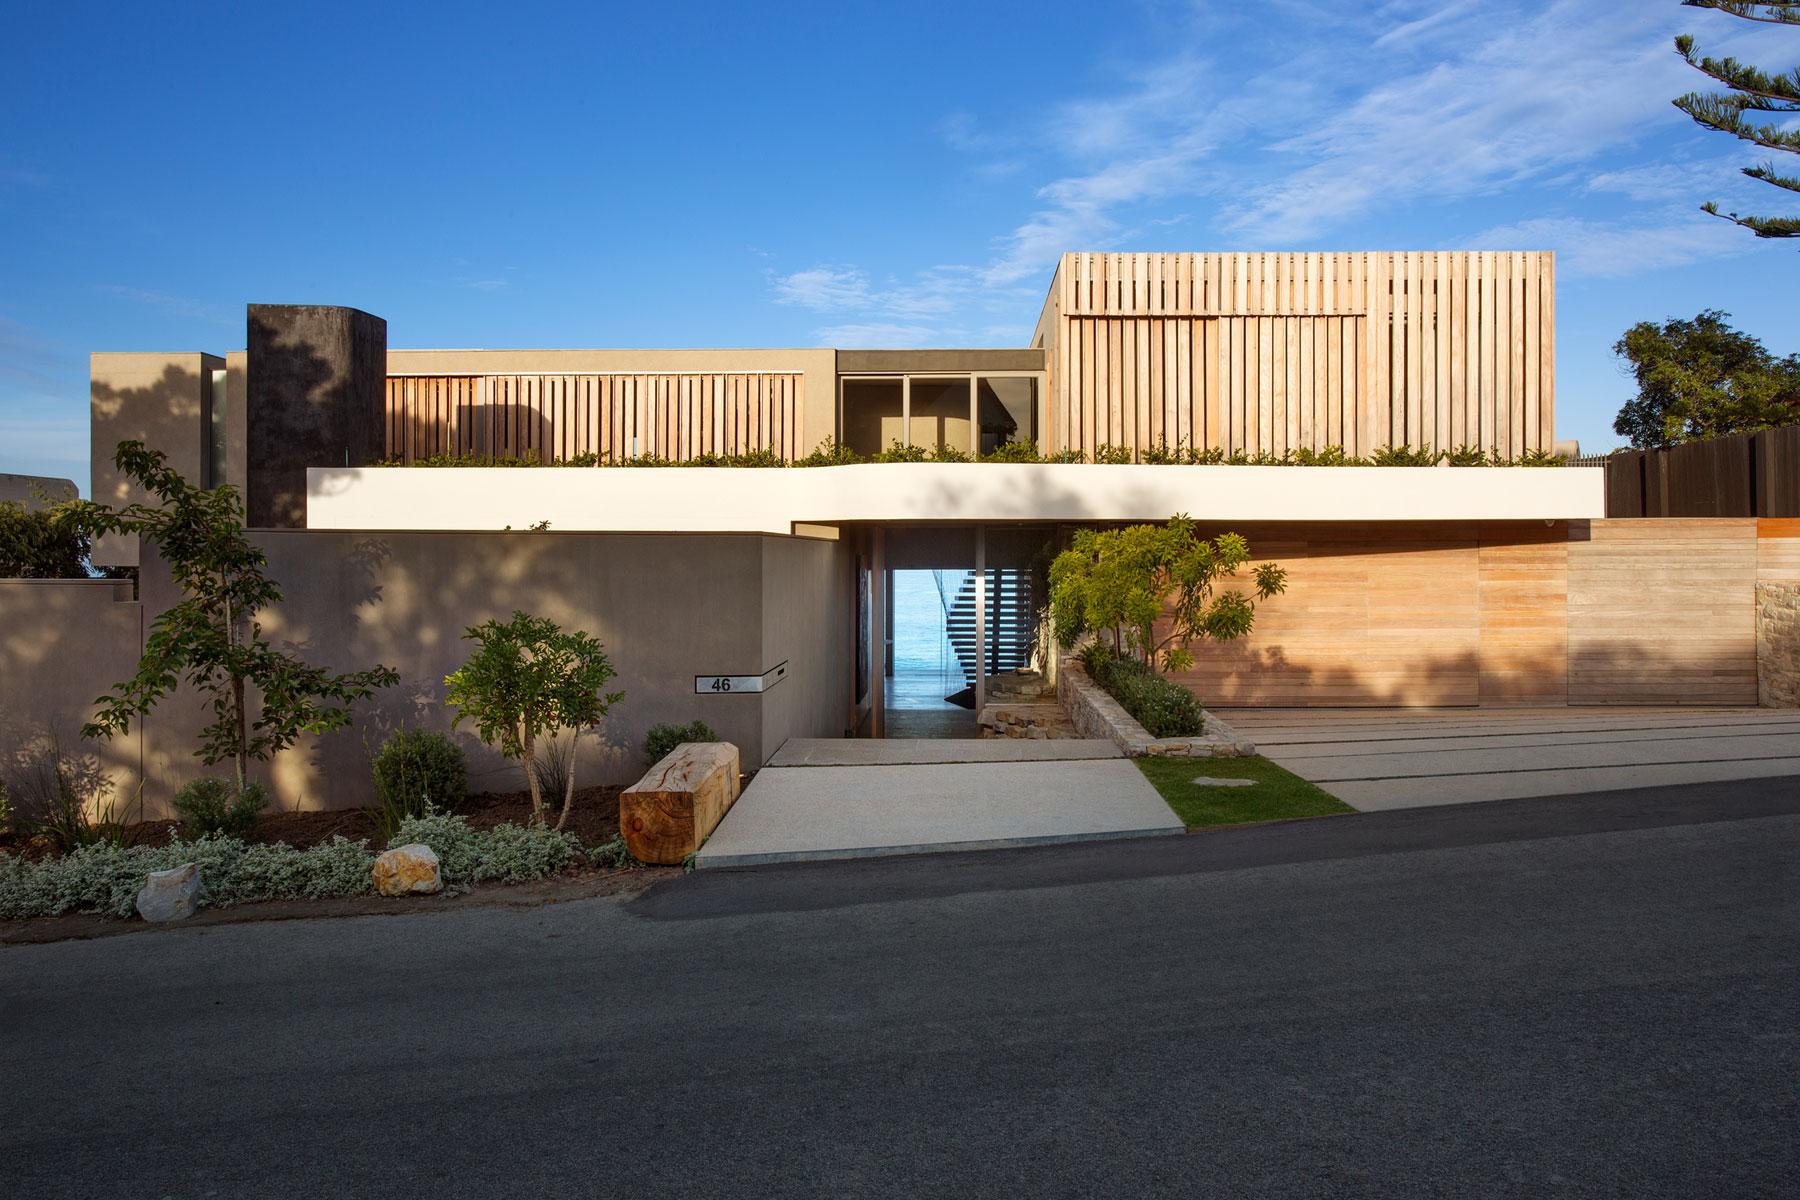 architecture-design-villa-luxuryhouse-southafrica-plettenbergbay-luxuryhouse-01